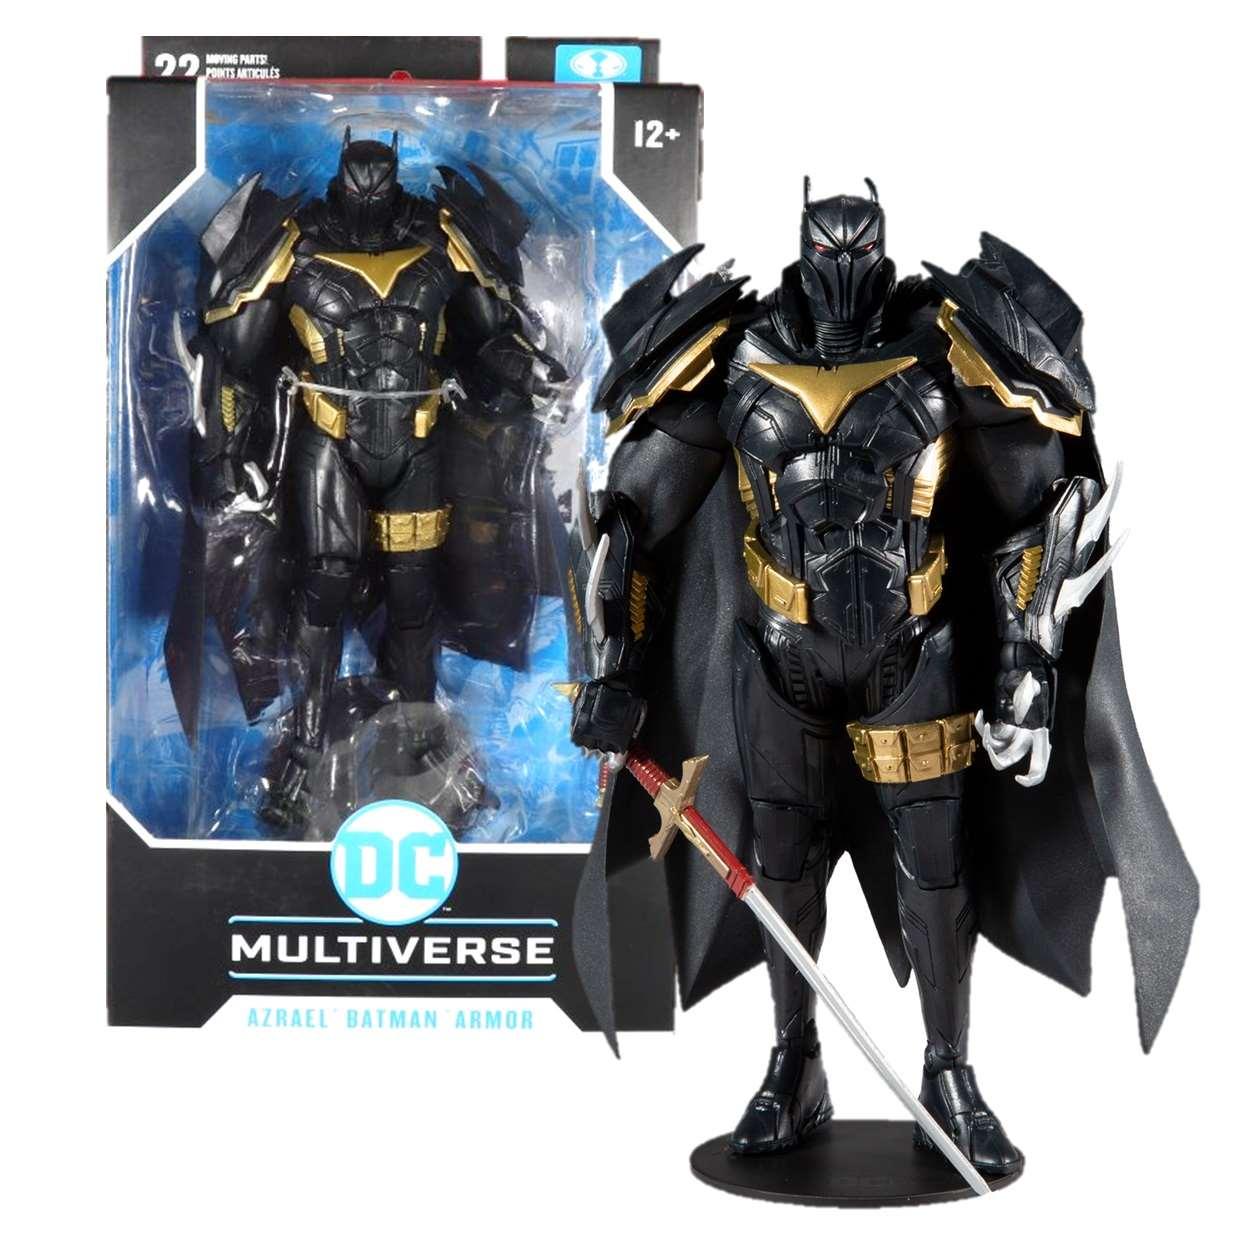 Azrael Batman Armor Curse Of The White Knight Multiverse